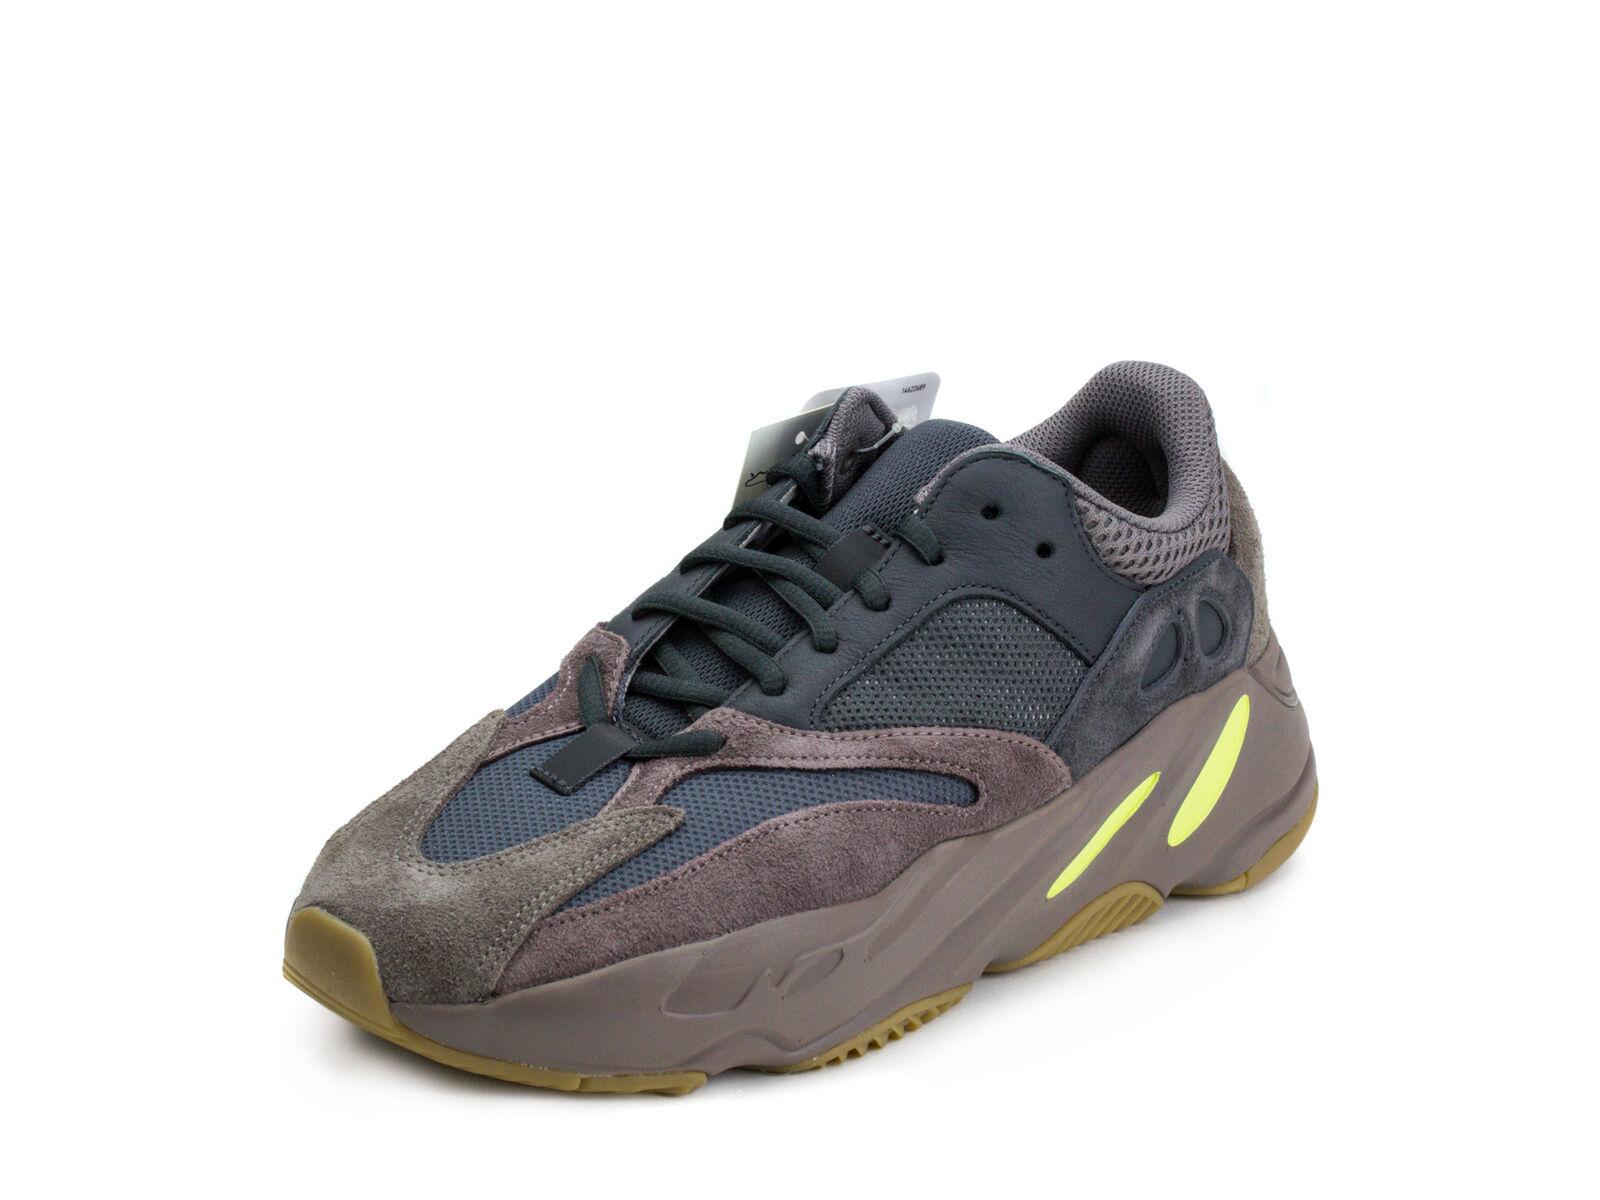 Adidas Mens Yeezy 700  Mauve  Grey EE9614